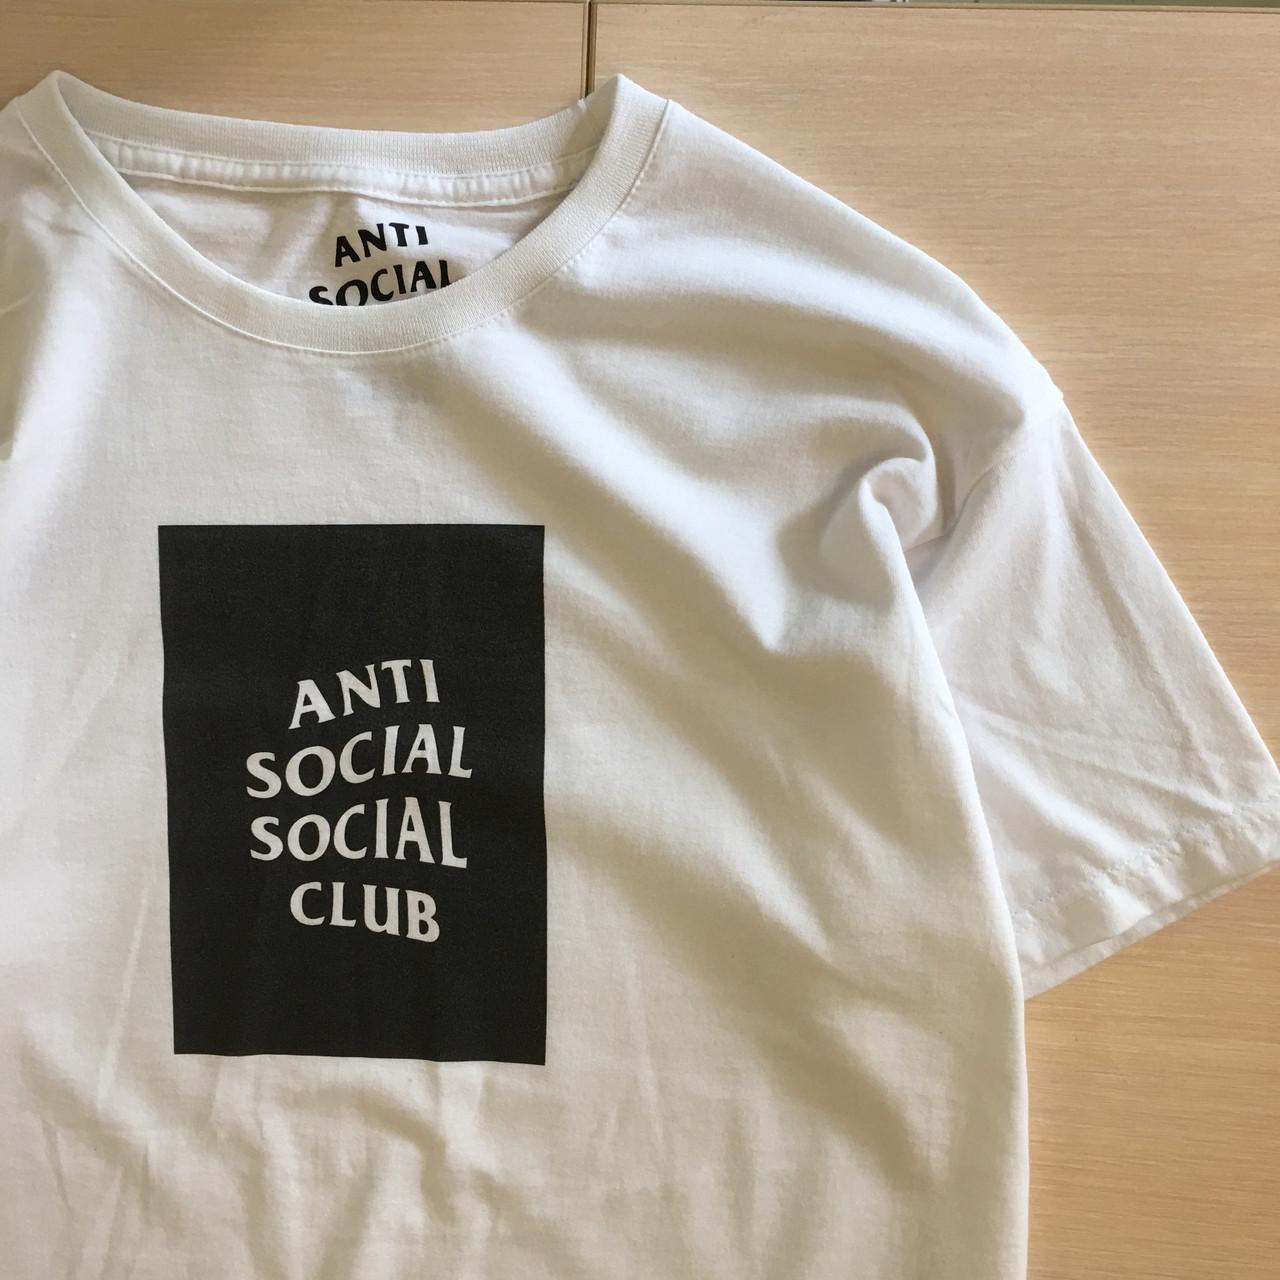 Футболка A.S.S.C. Белая Anti Social social club | Бирки